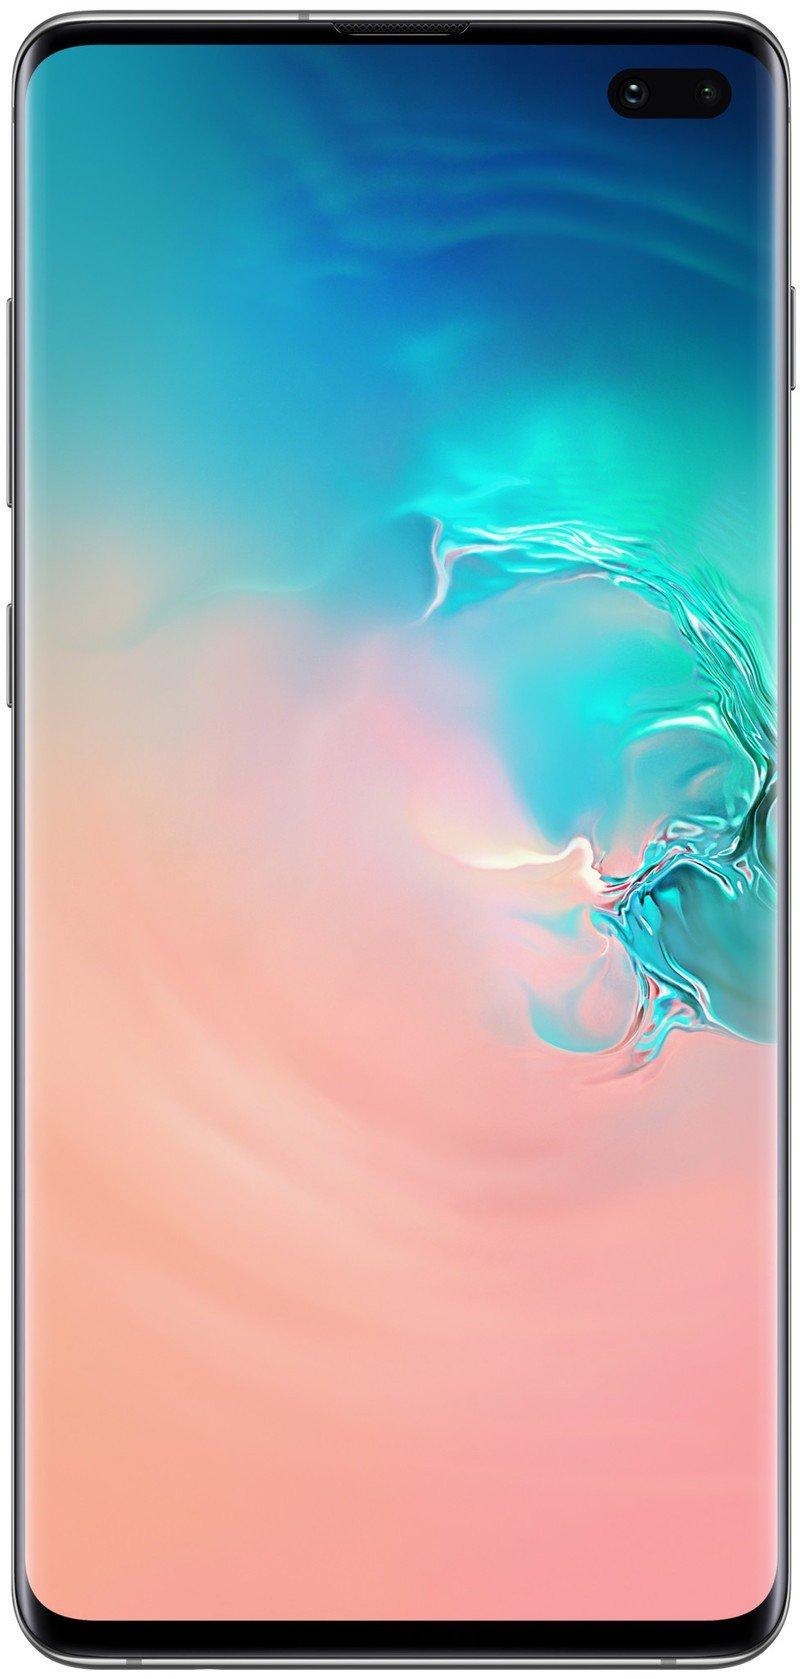 galaxy-s10-plus-render-front-white.jpg